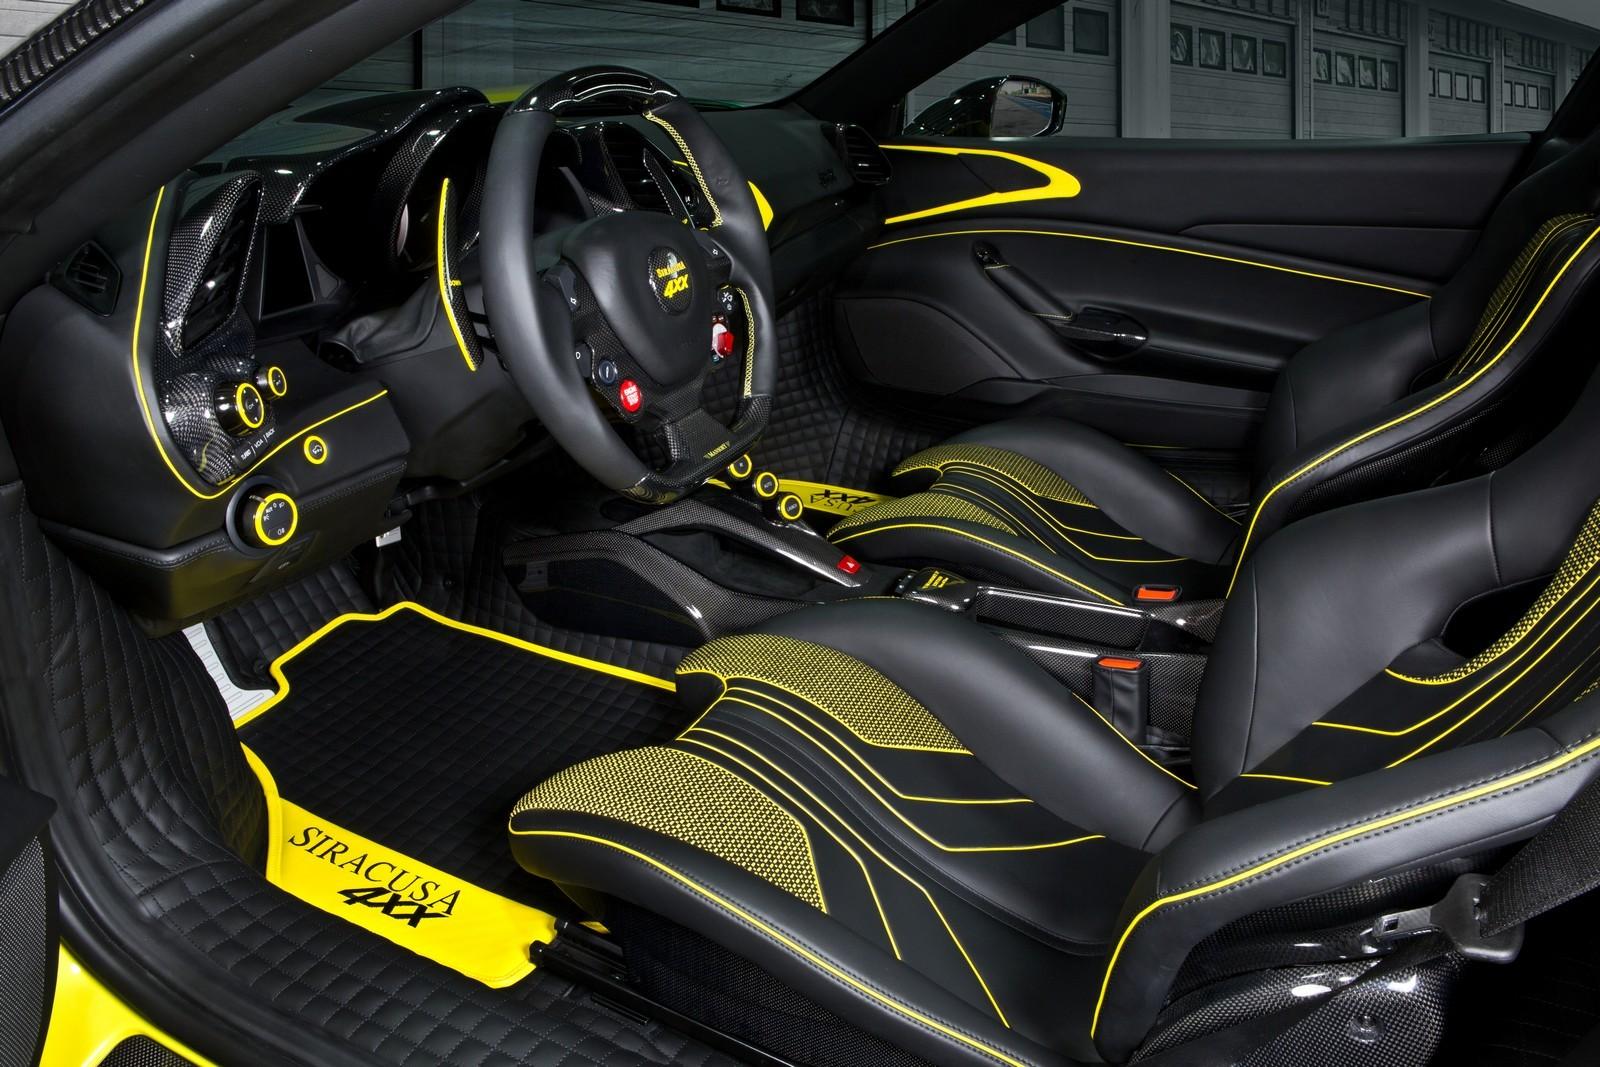 Mansory 4XX Based On Ferrari 488 GTB Looks Like A Baby FXX